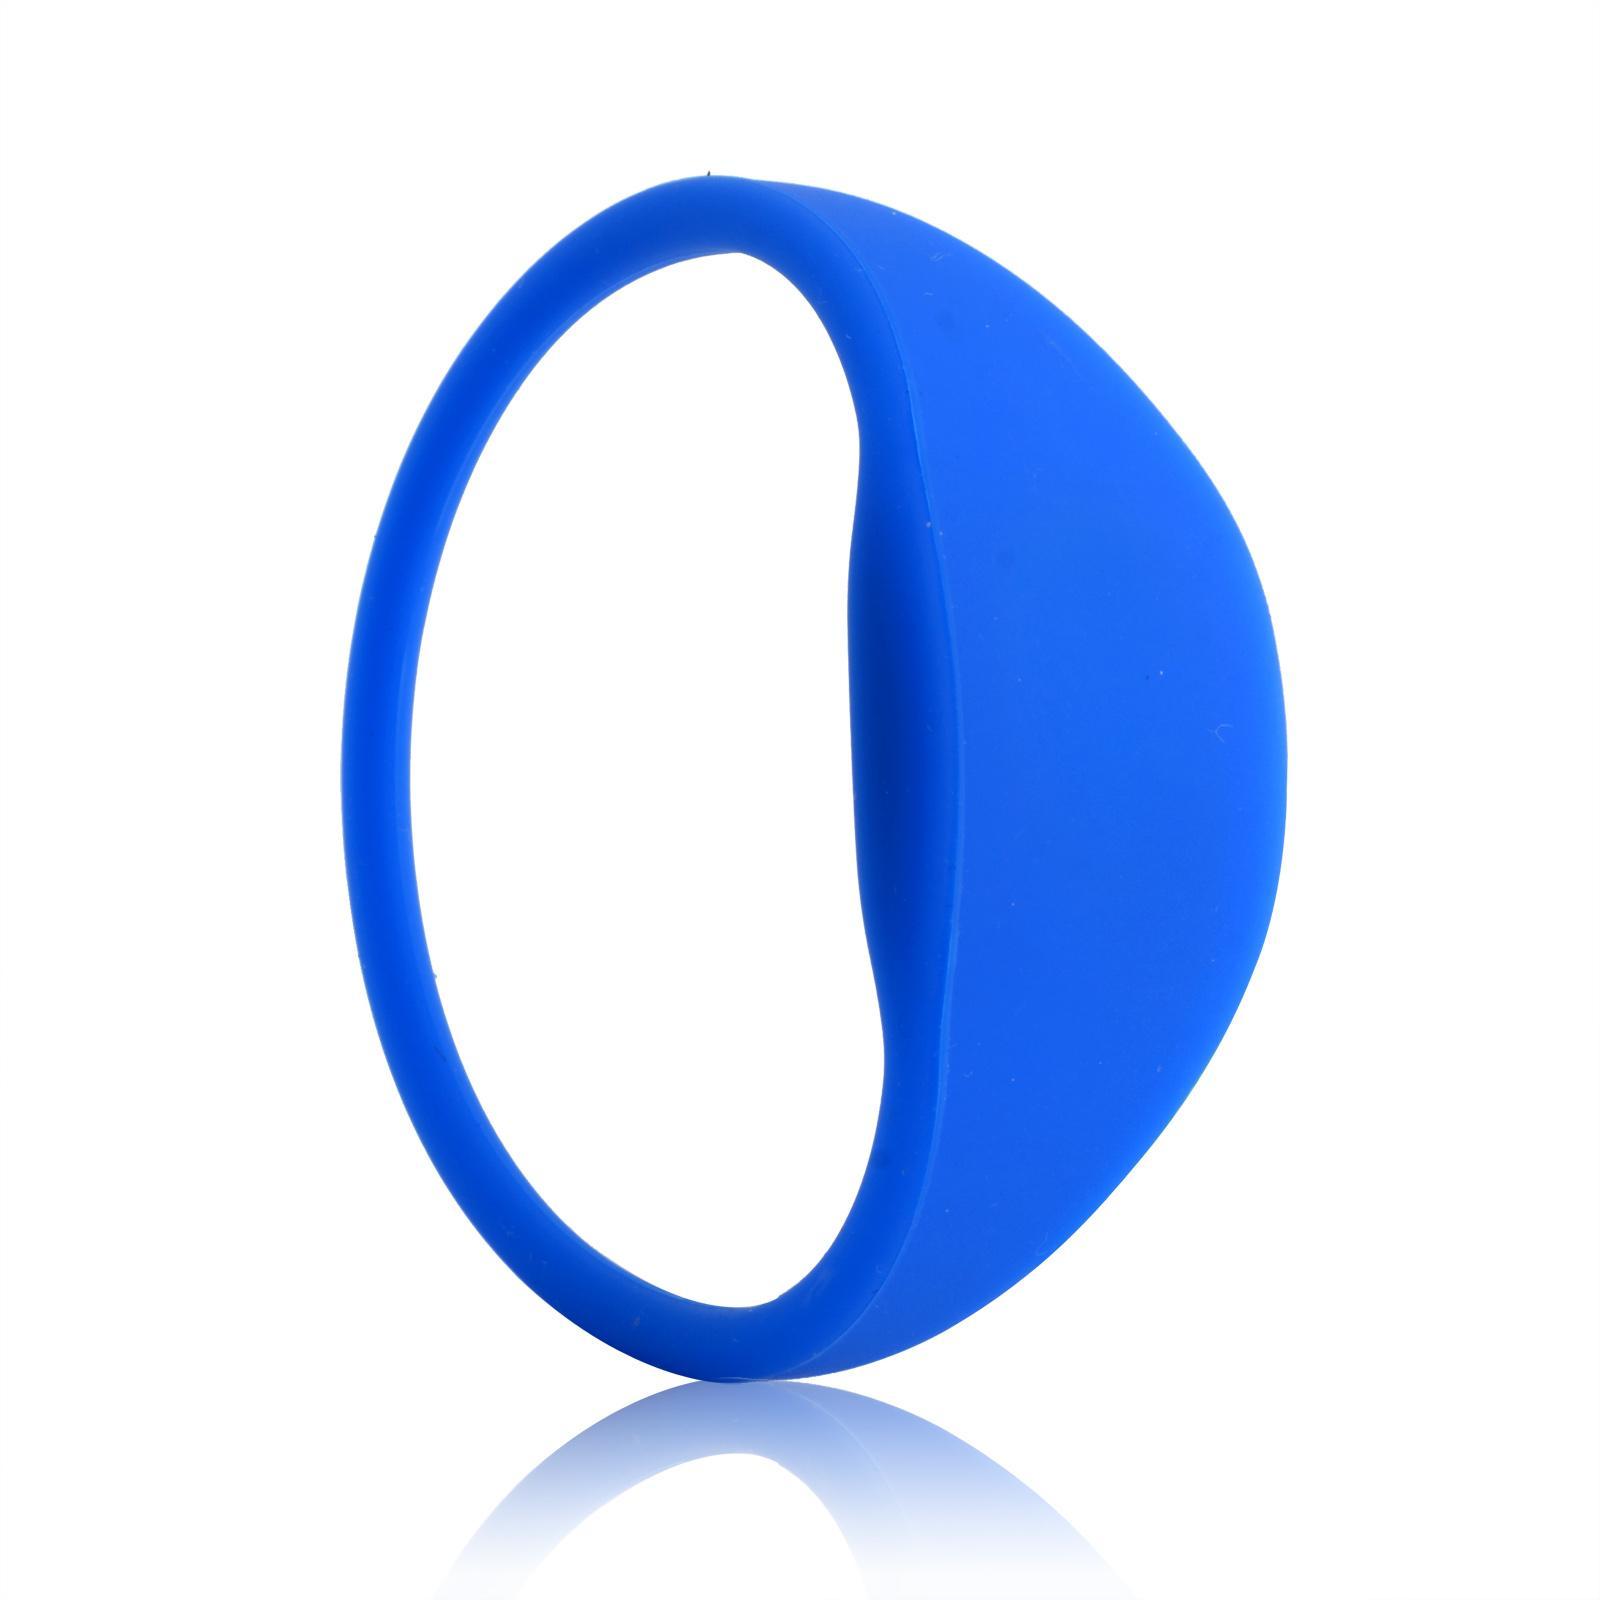 Silicone Soft RFID Bracelet/TK4100 Wristband For Access Control/GYM  2